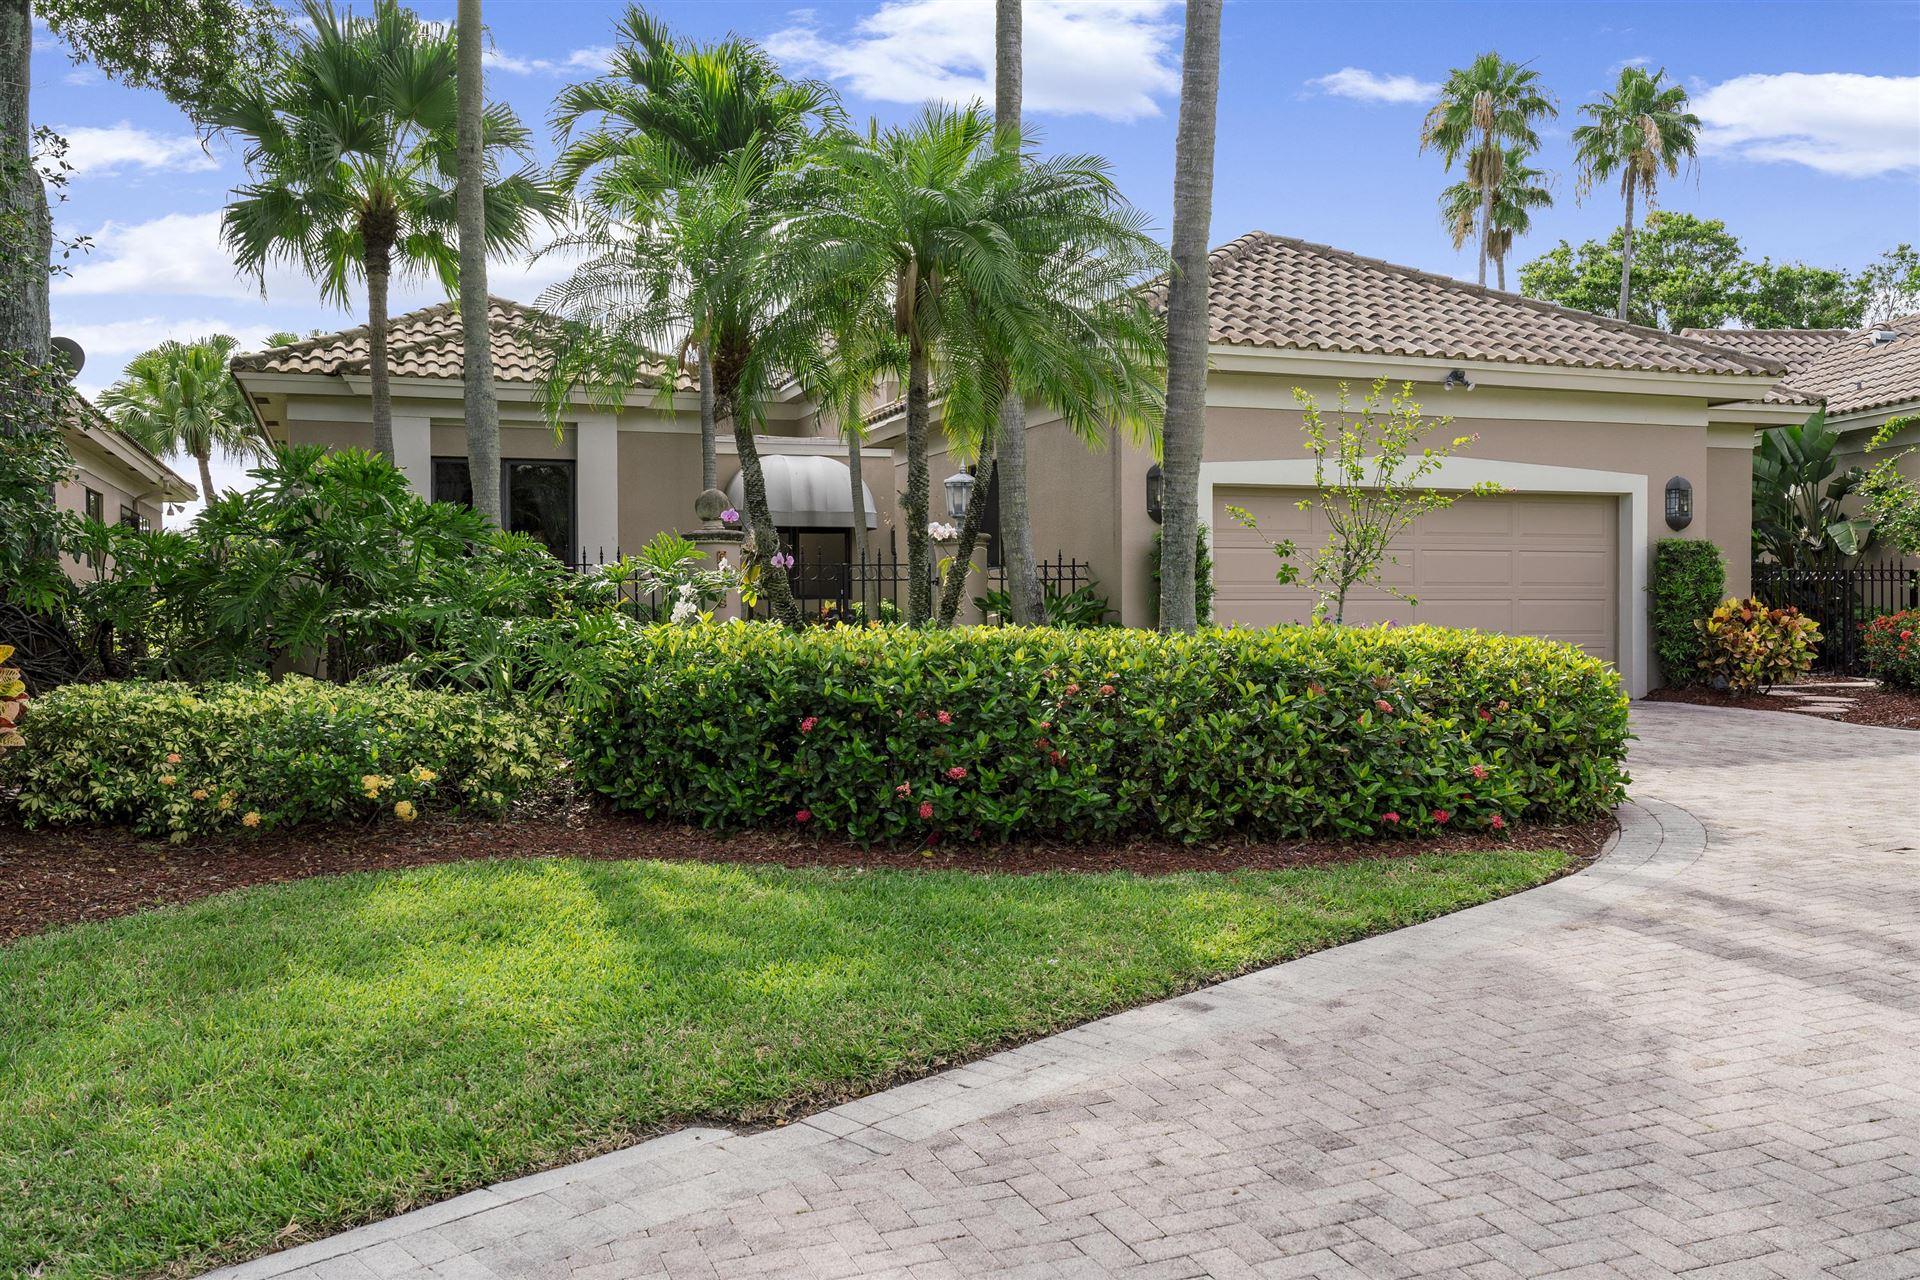 6095 NW 23rd Avenue, Boca Raton, FL 33496 - #: RX-10622602